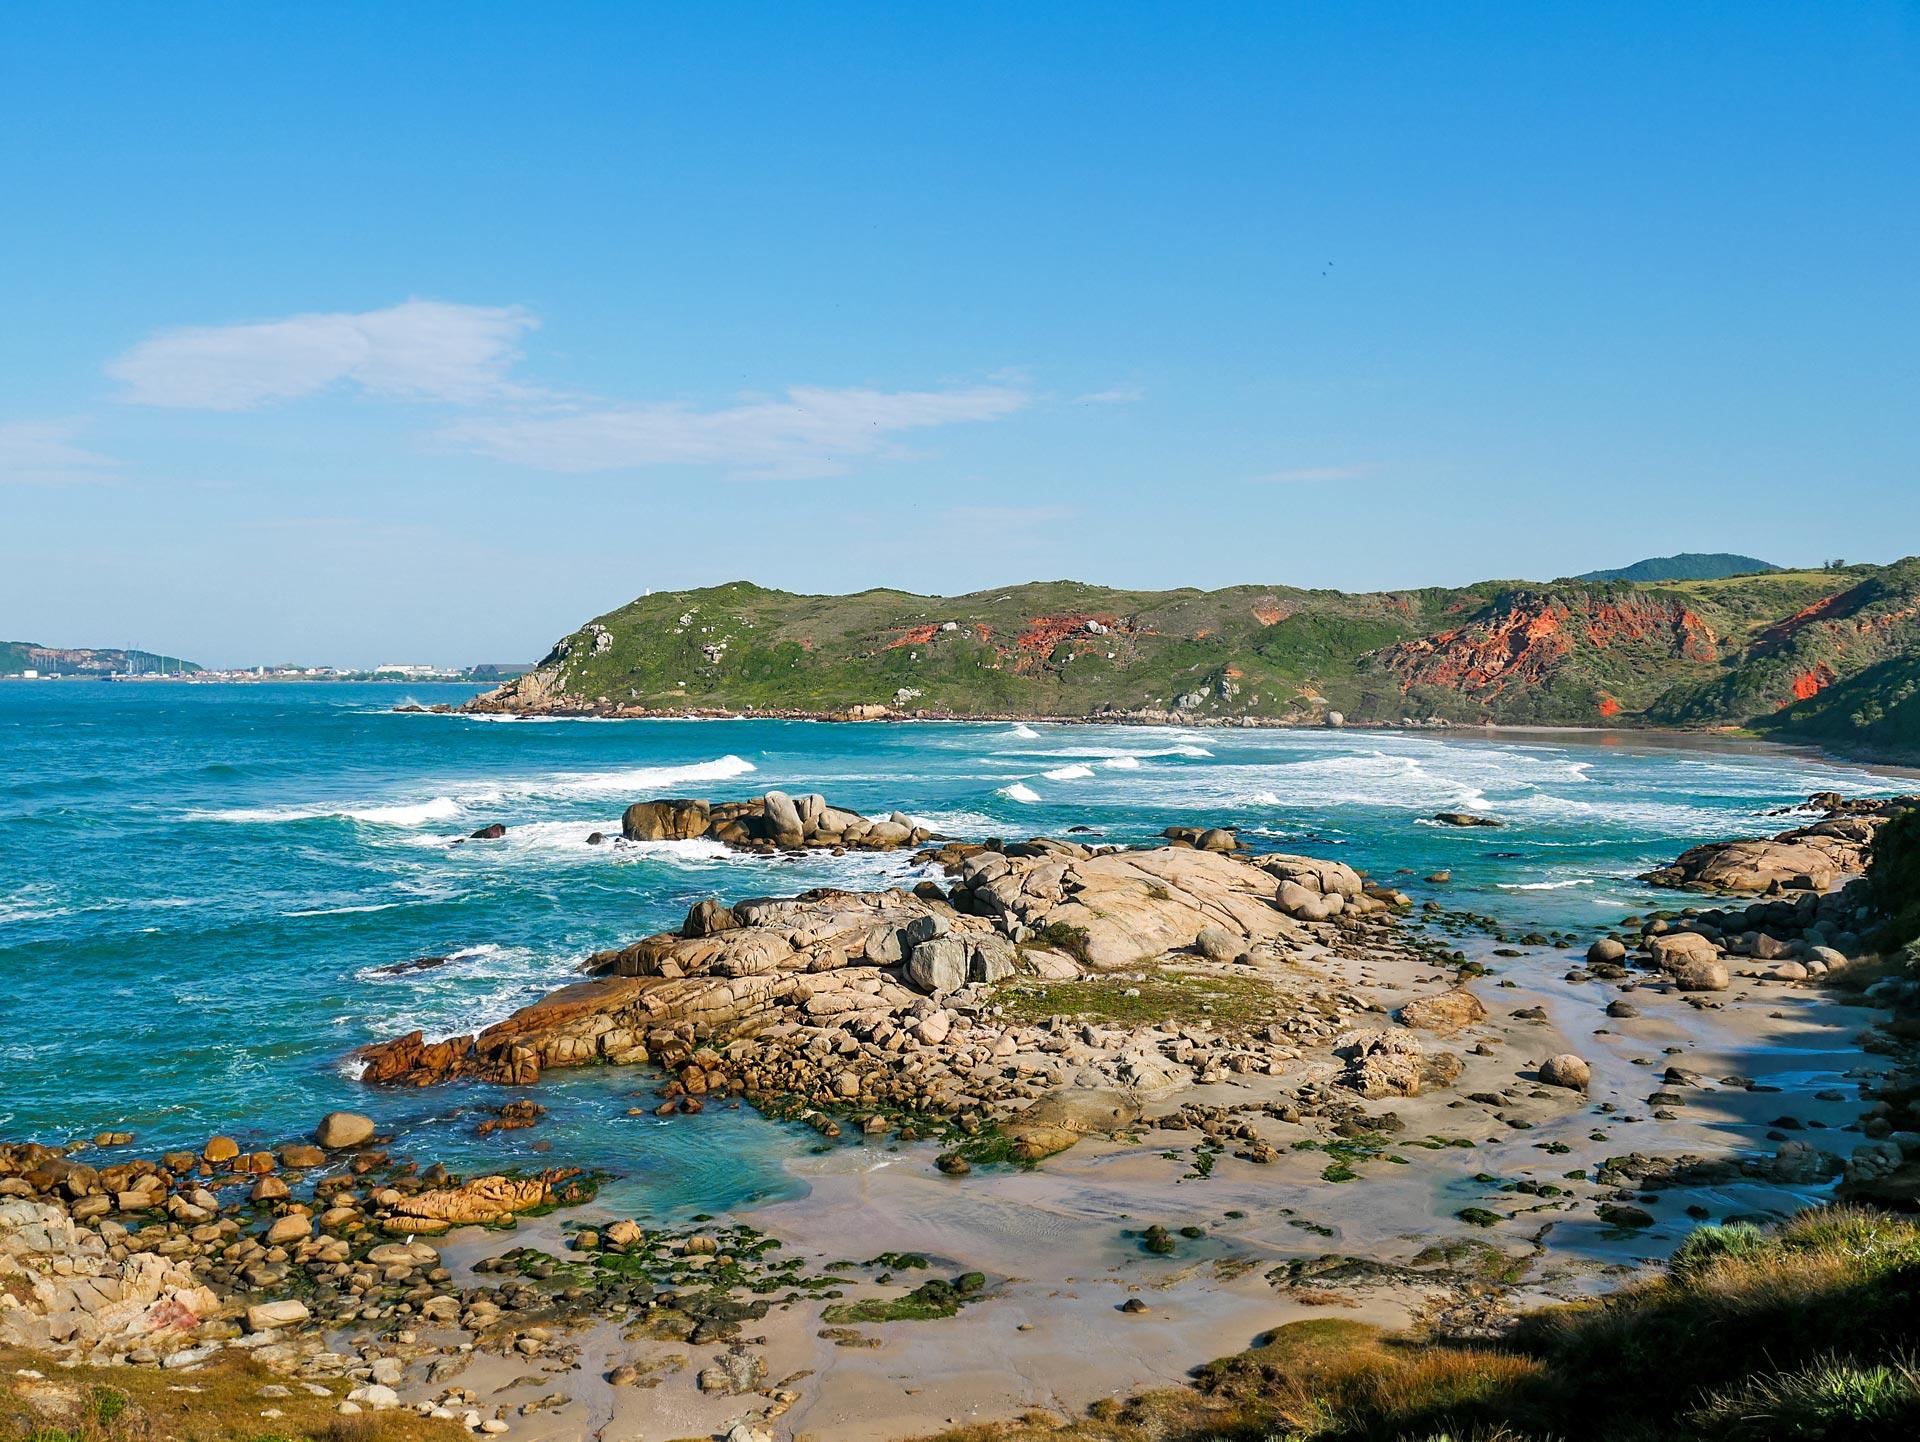 Beach, ocean and surrounding mountains of Praia D'água in Imbituba, Brazil